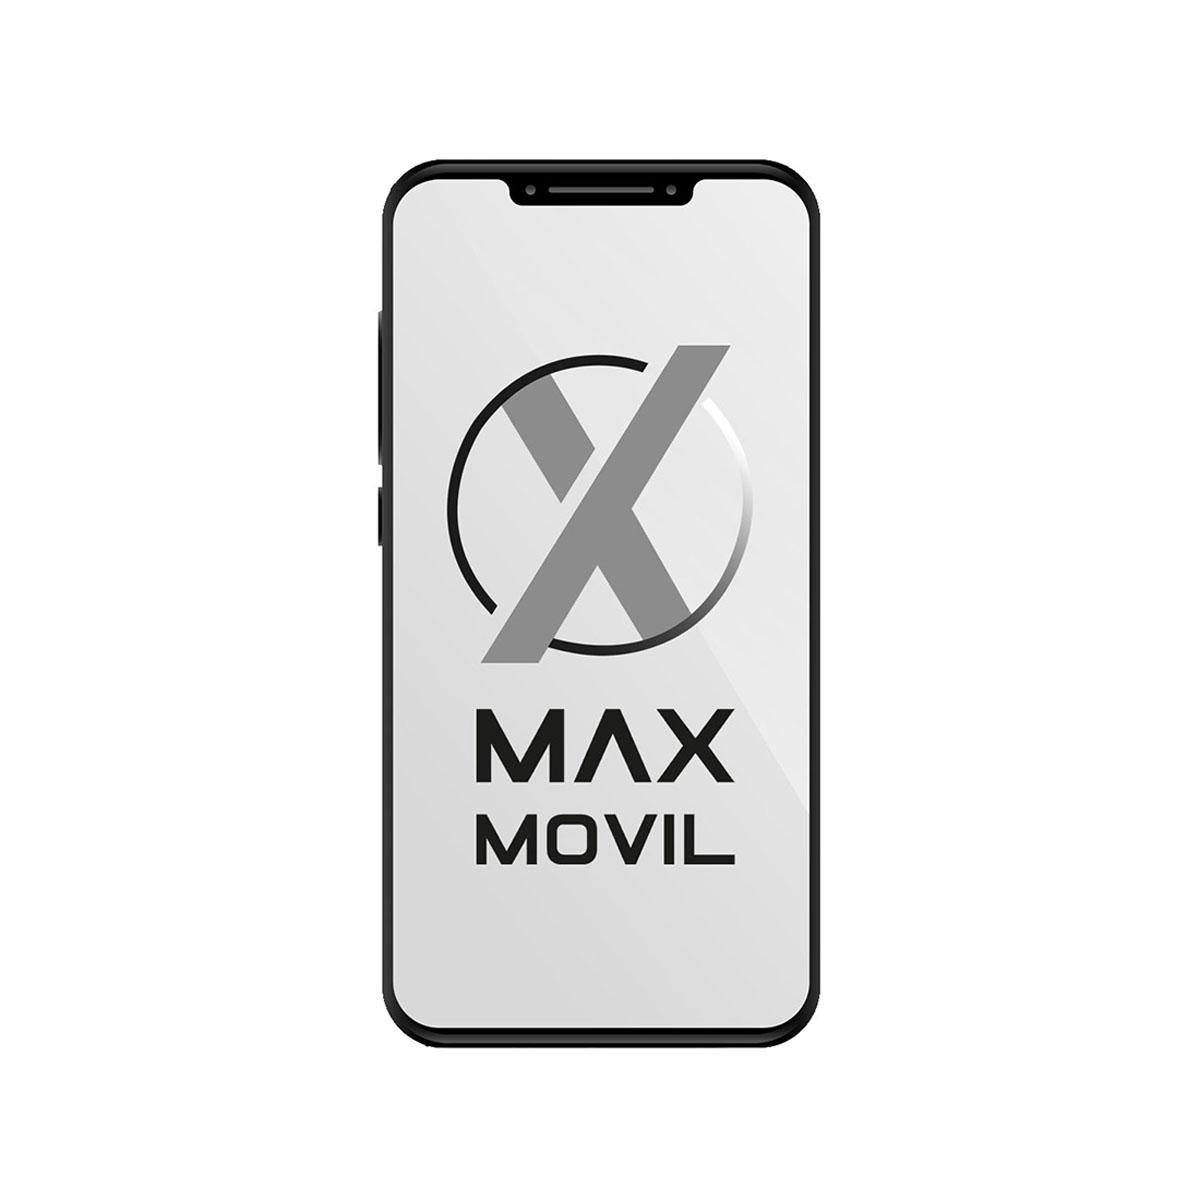 Apple Watch Series 5 Nike GPS + Cellular, Caja 44mm Aluminio Plata y correa deportiva platino puro/negro MX3E2TY/A